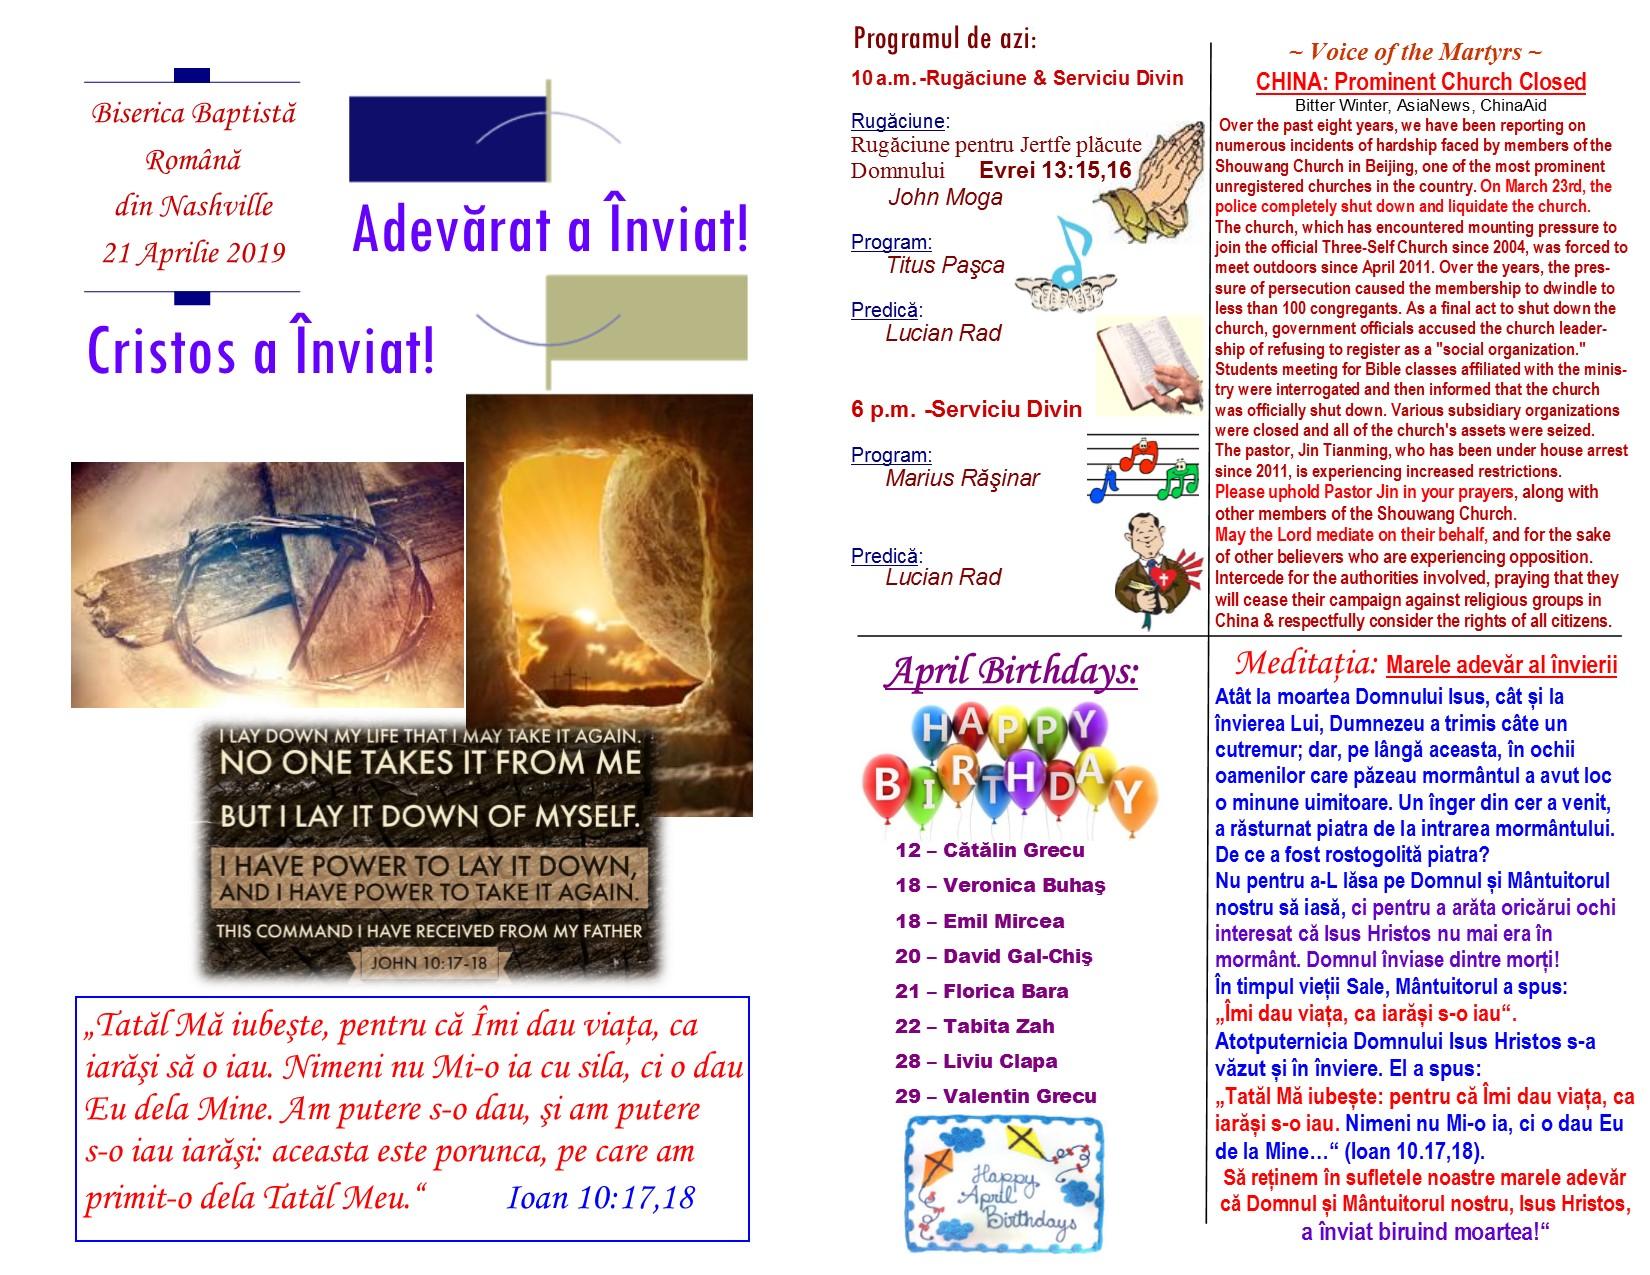 Buletin 04-21-19 page 1 & 2